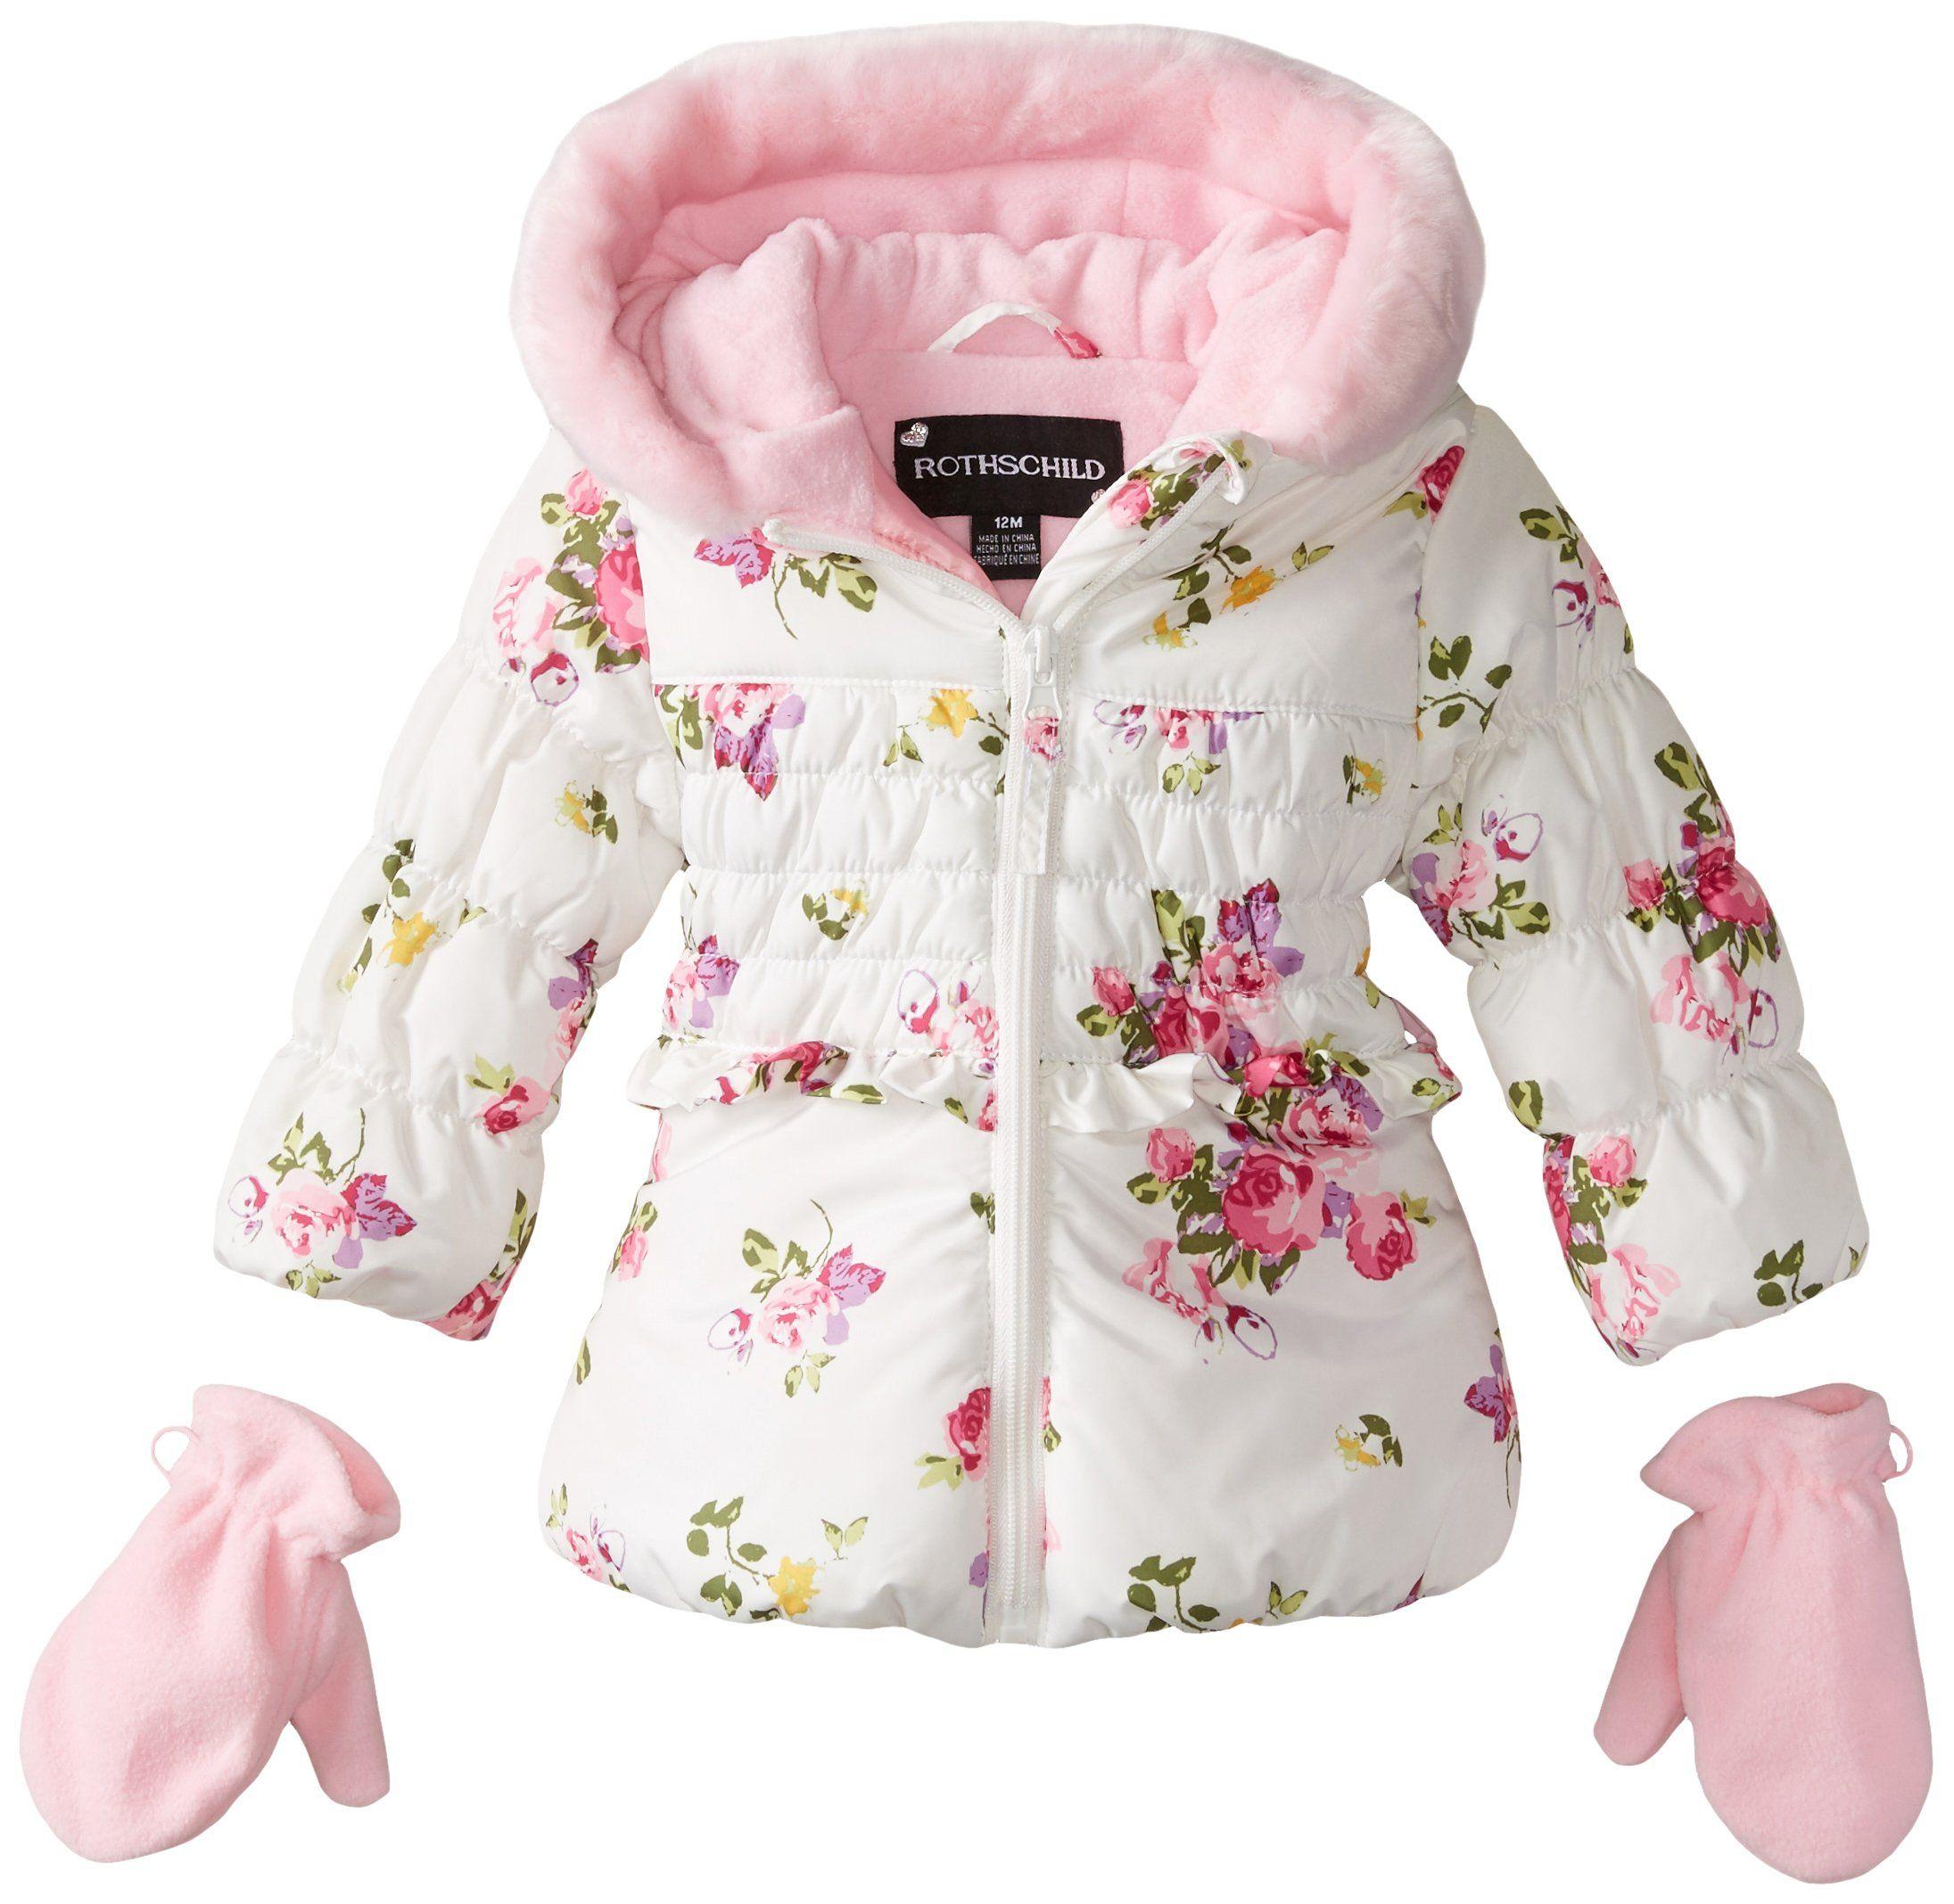 706fb6dba Rothschild Baby Girls Tonal Rose Print Jacket, Rose Floral, 18 ...